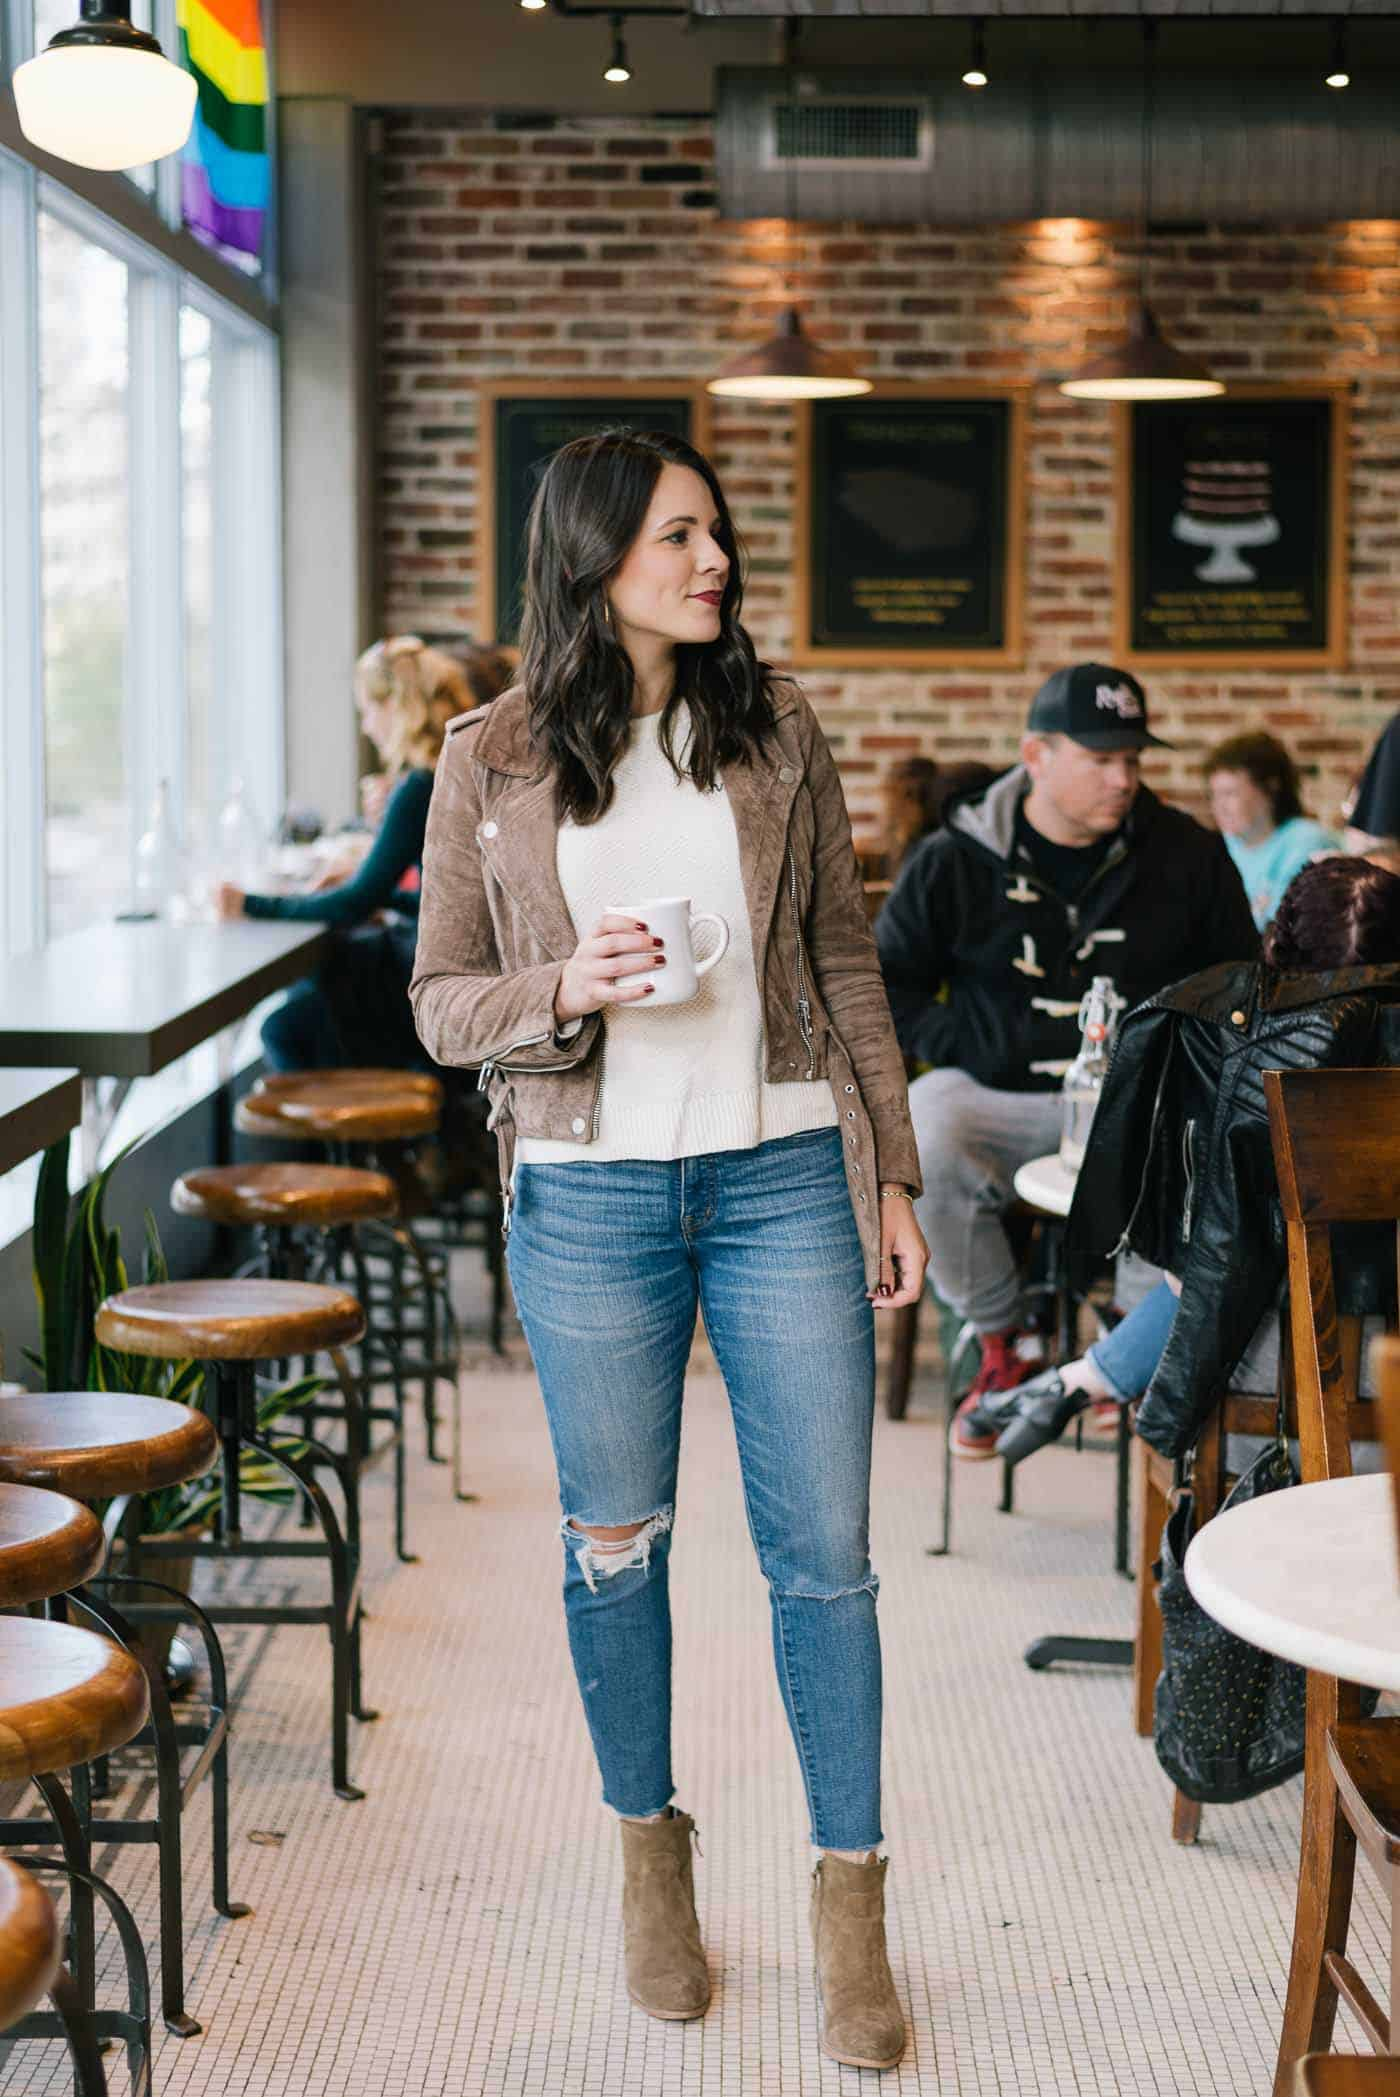 a7077ebece A Must visit Asheville Dessert   Coffee Shop - My Style Vita